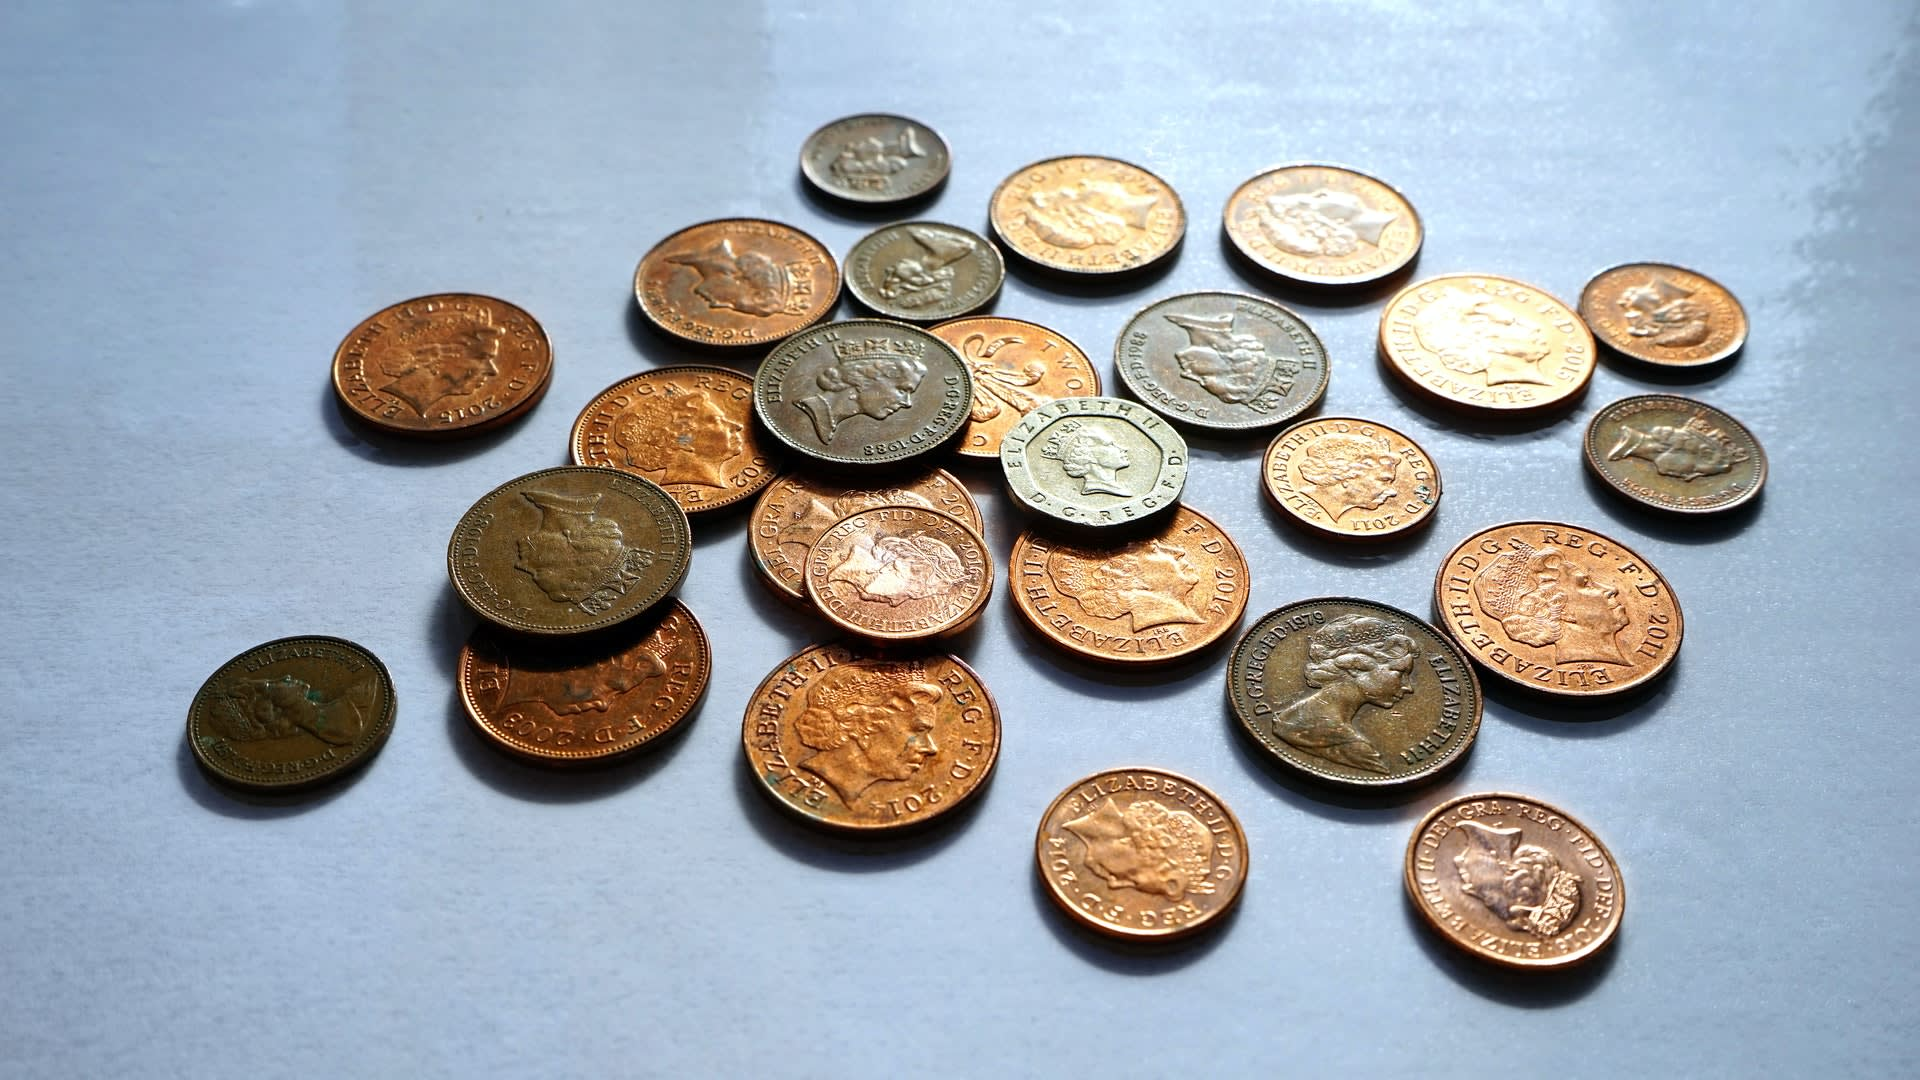 Halifax £10k fraud victim gets £1 back